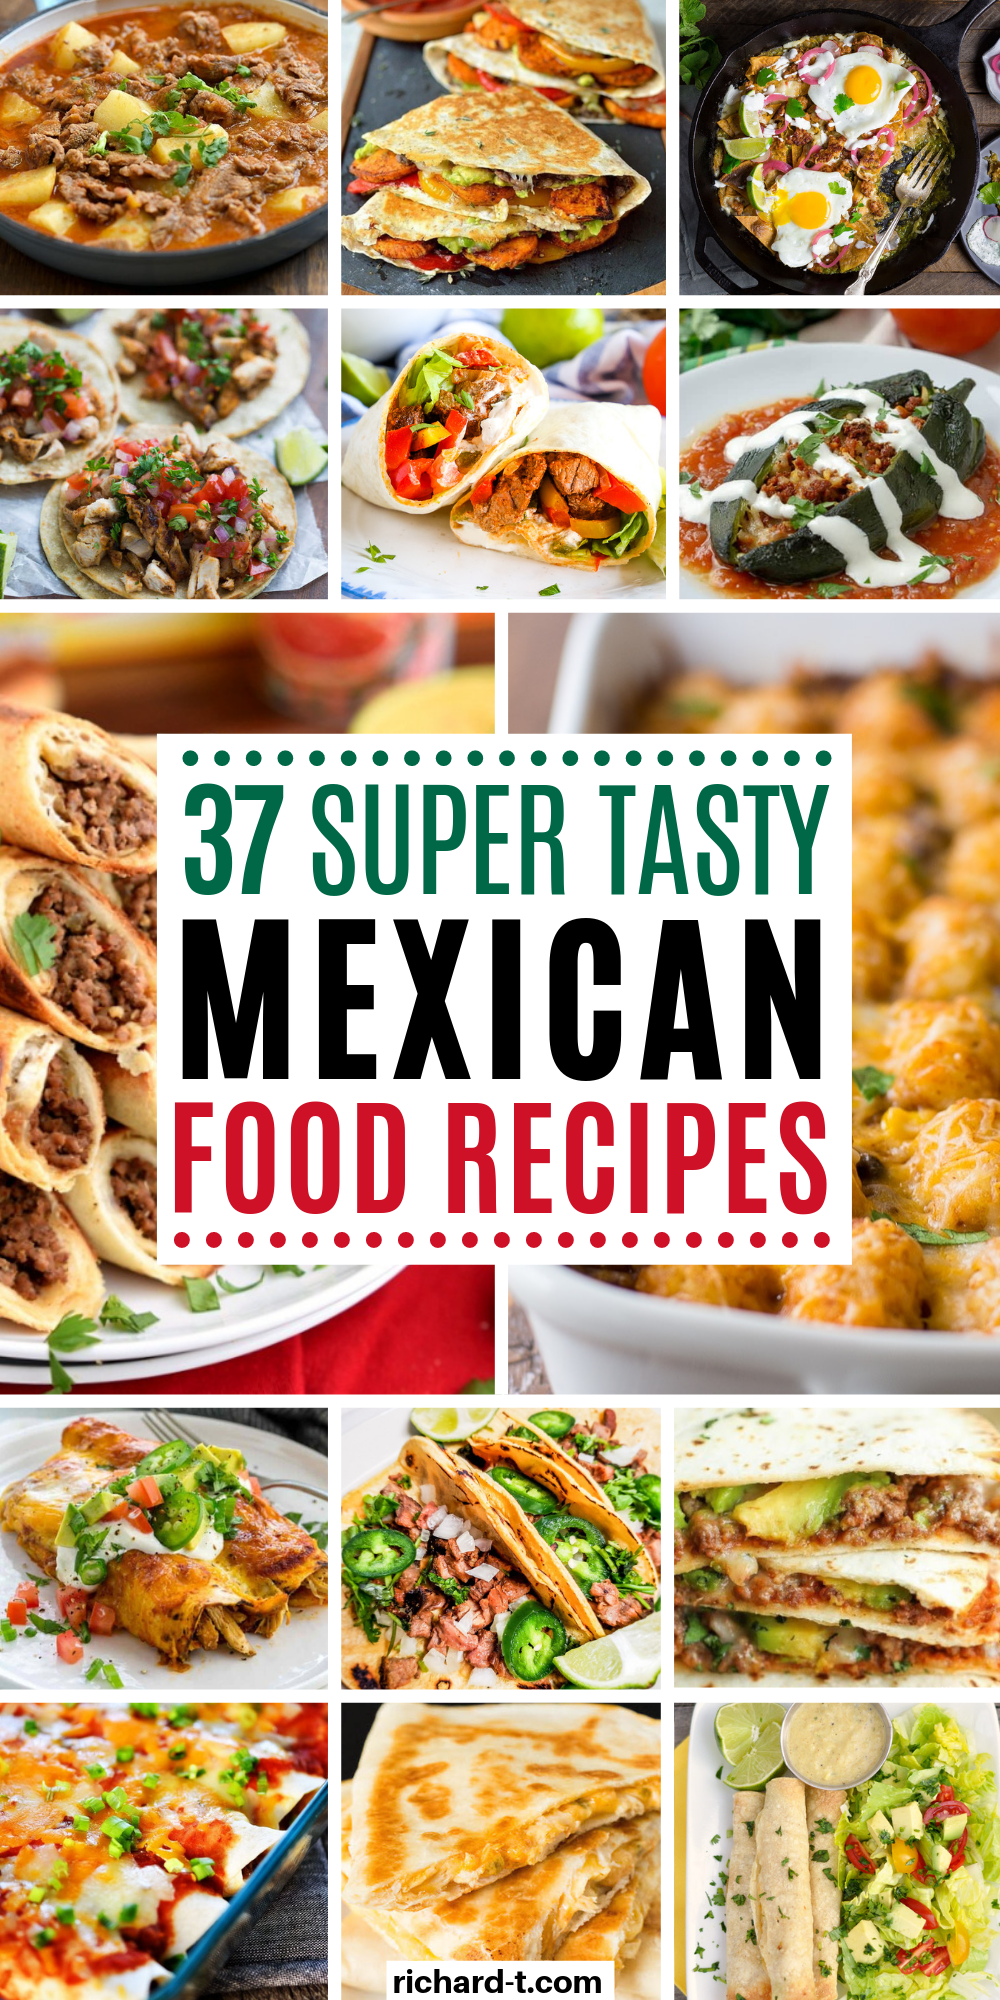 37 Delicious Mexican Food Recipes #easymexicanfoodrecipes